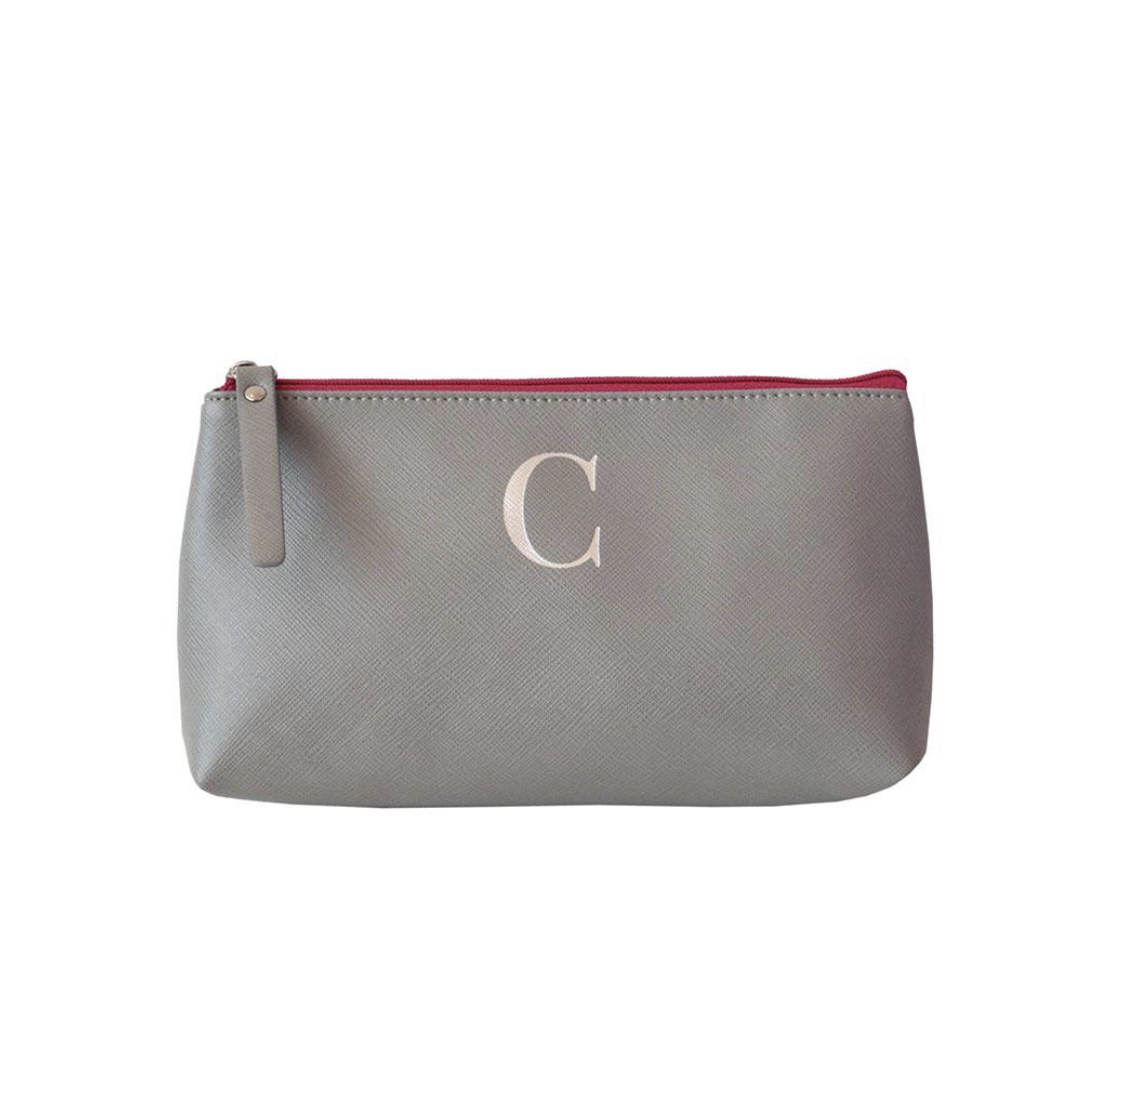 Bombay Duck Alphabet Make Up Bag - C